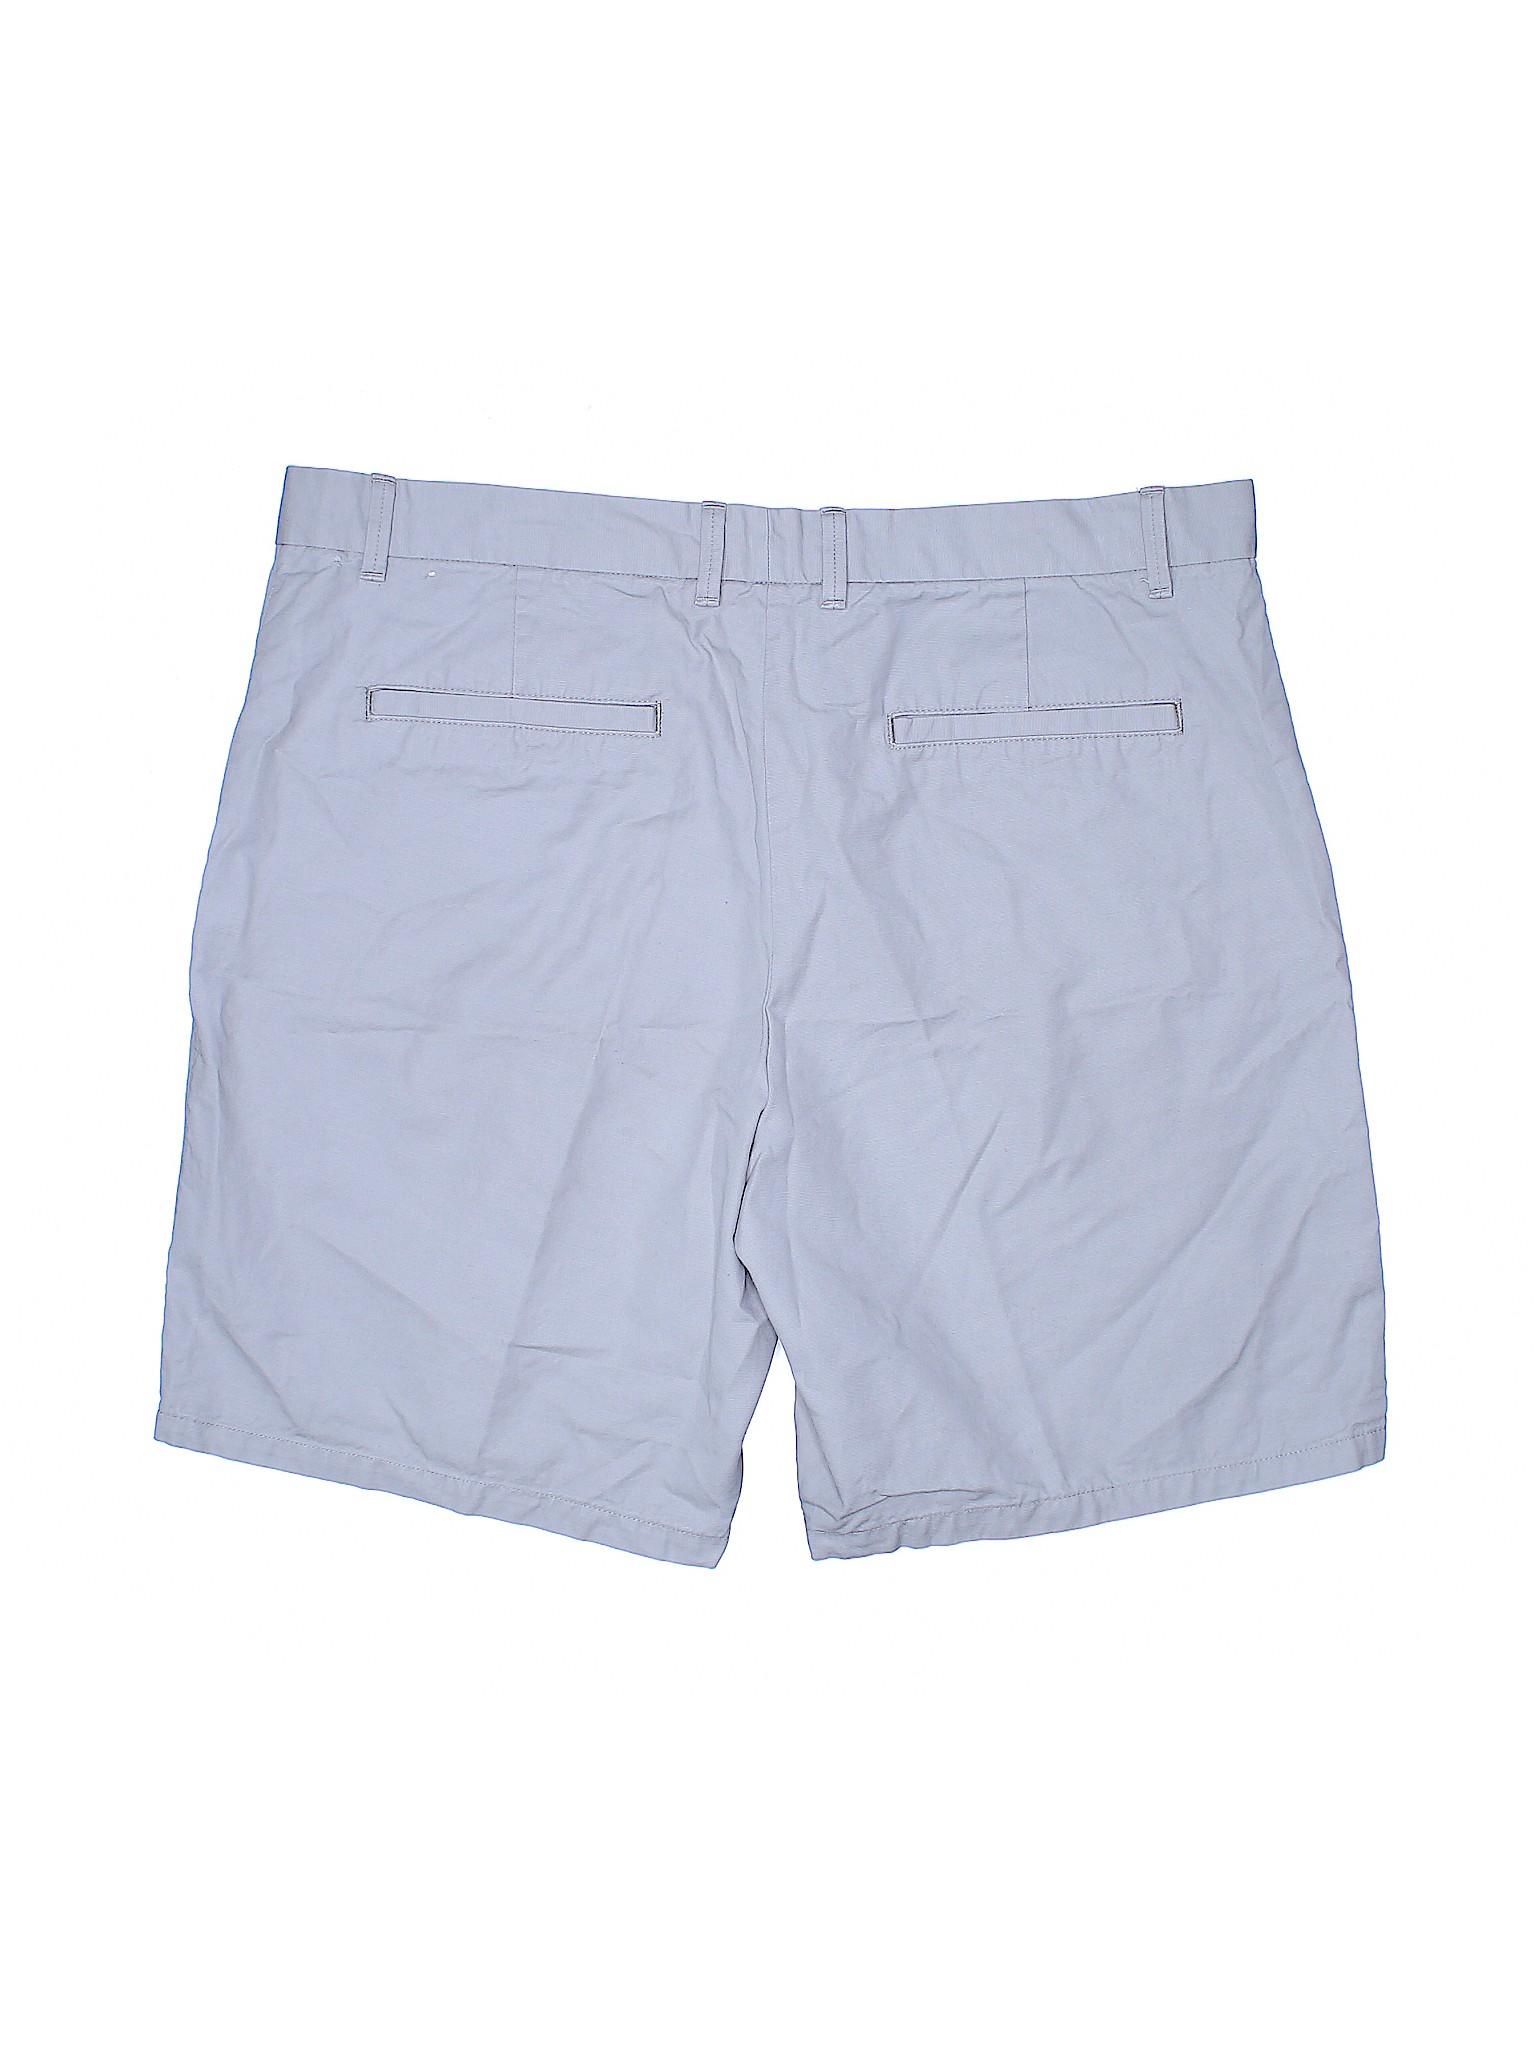 leisure Gap Shorts Boutique Boutique leisure Gap Khaki xOYzxwtq